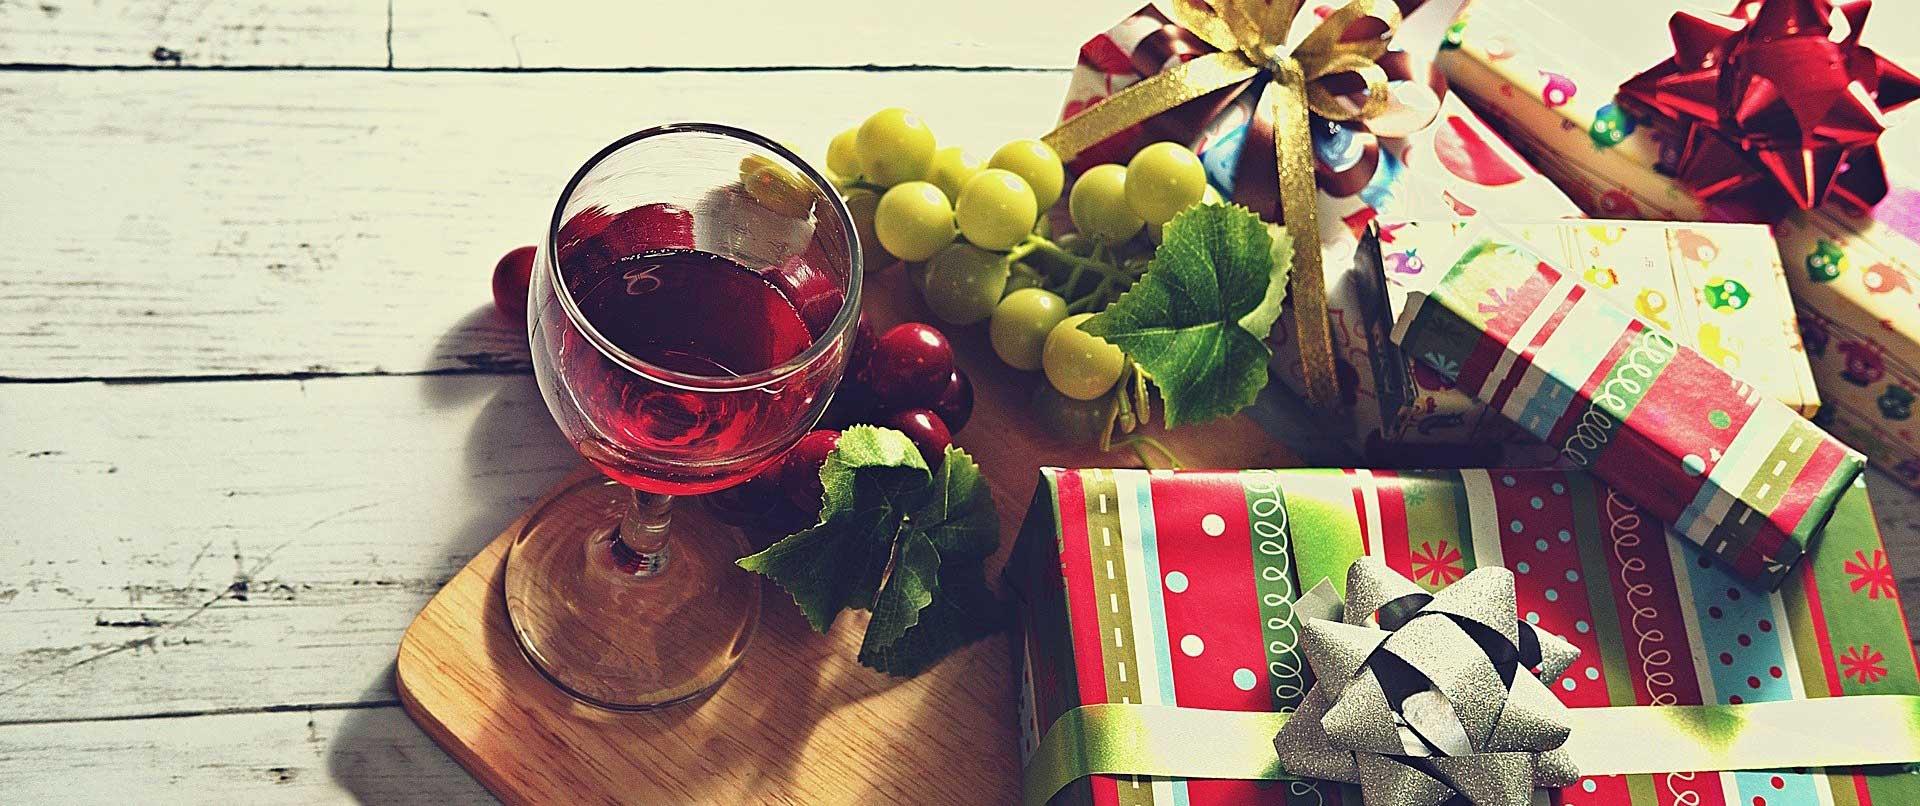 GREEN QUEEN | חנות מתנות ליום הולדת בשלל צבעים, גדלים ומחירים.